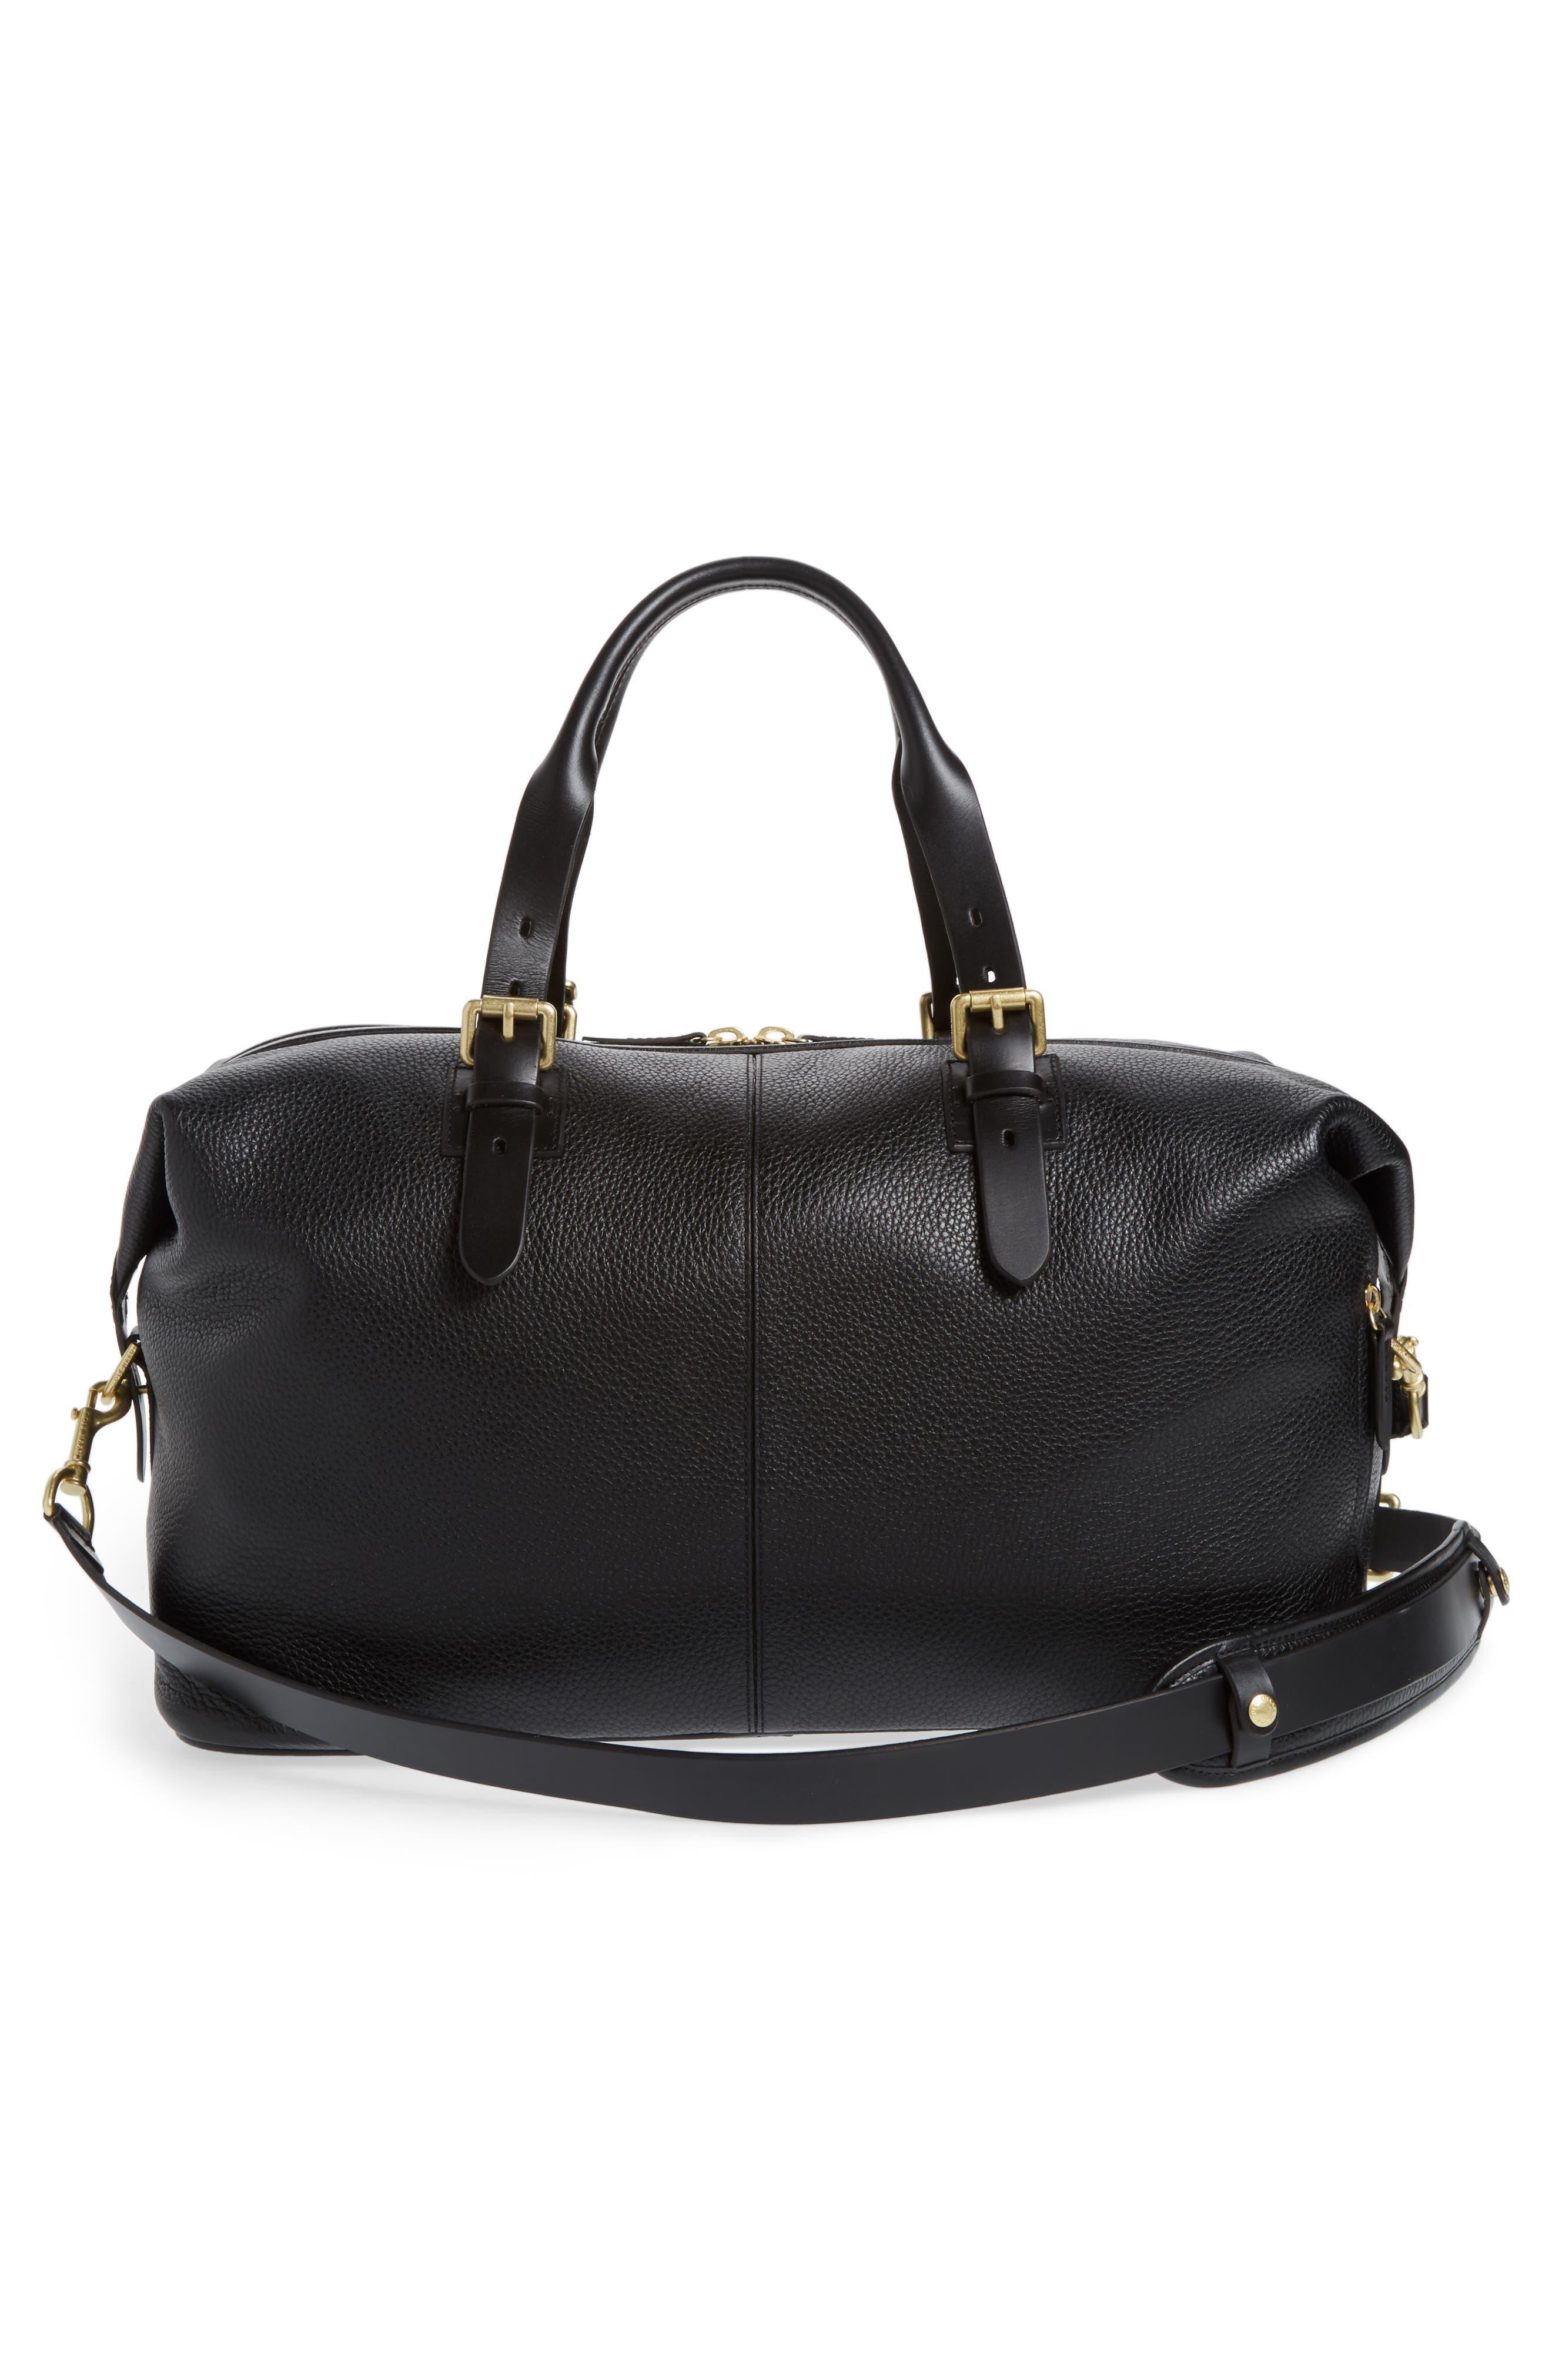 Leather Duffel Bag,                             Alternate thumbnail 3, color,                             Black